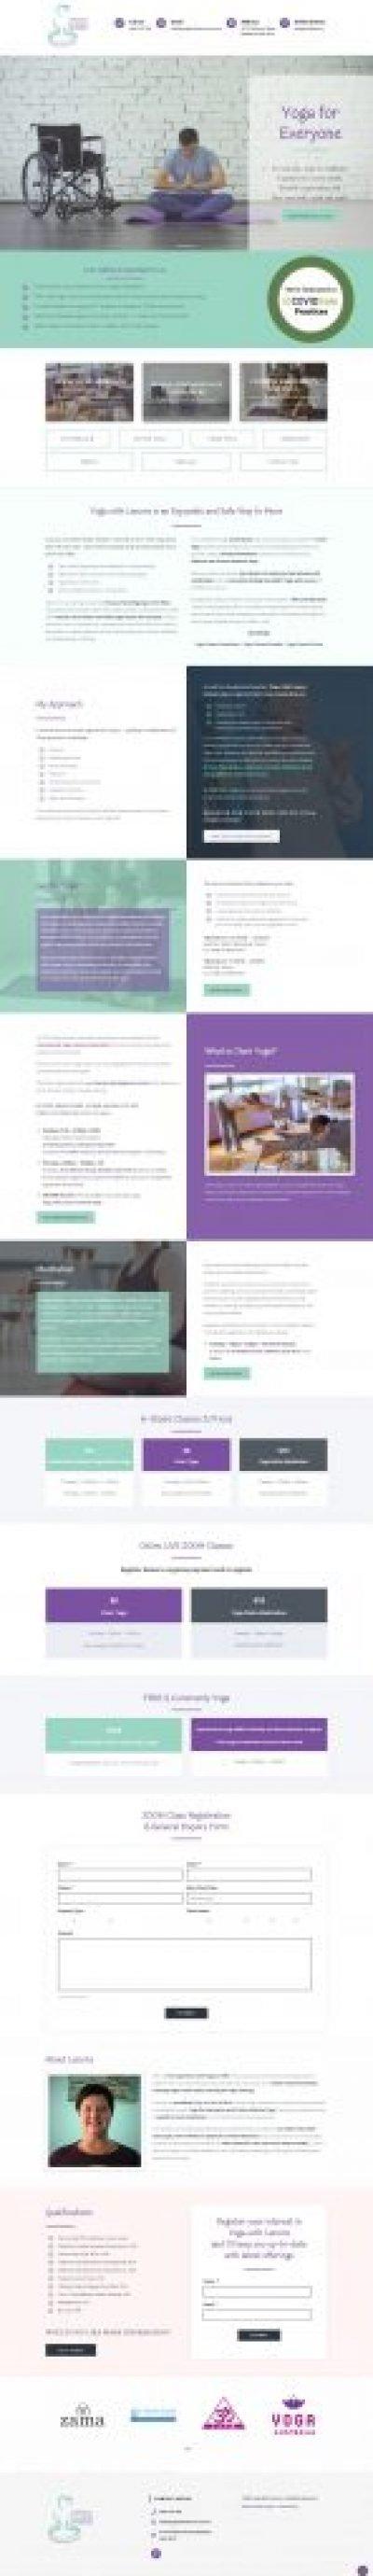 Yoga studio website designer Sunshine Coast